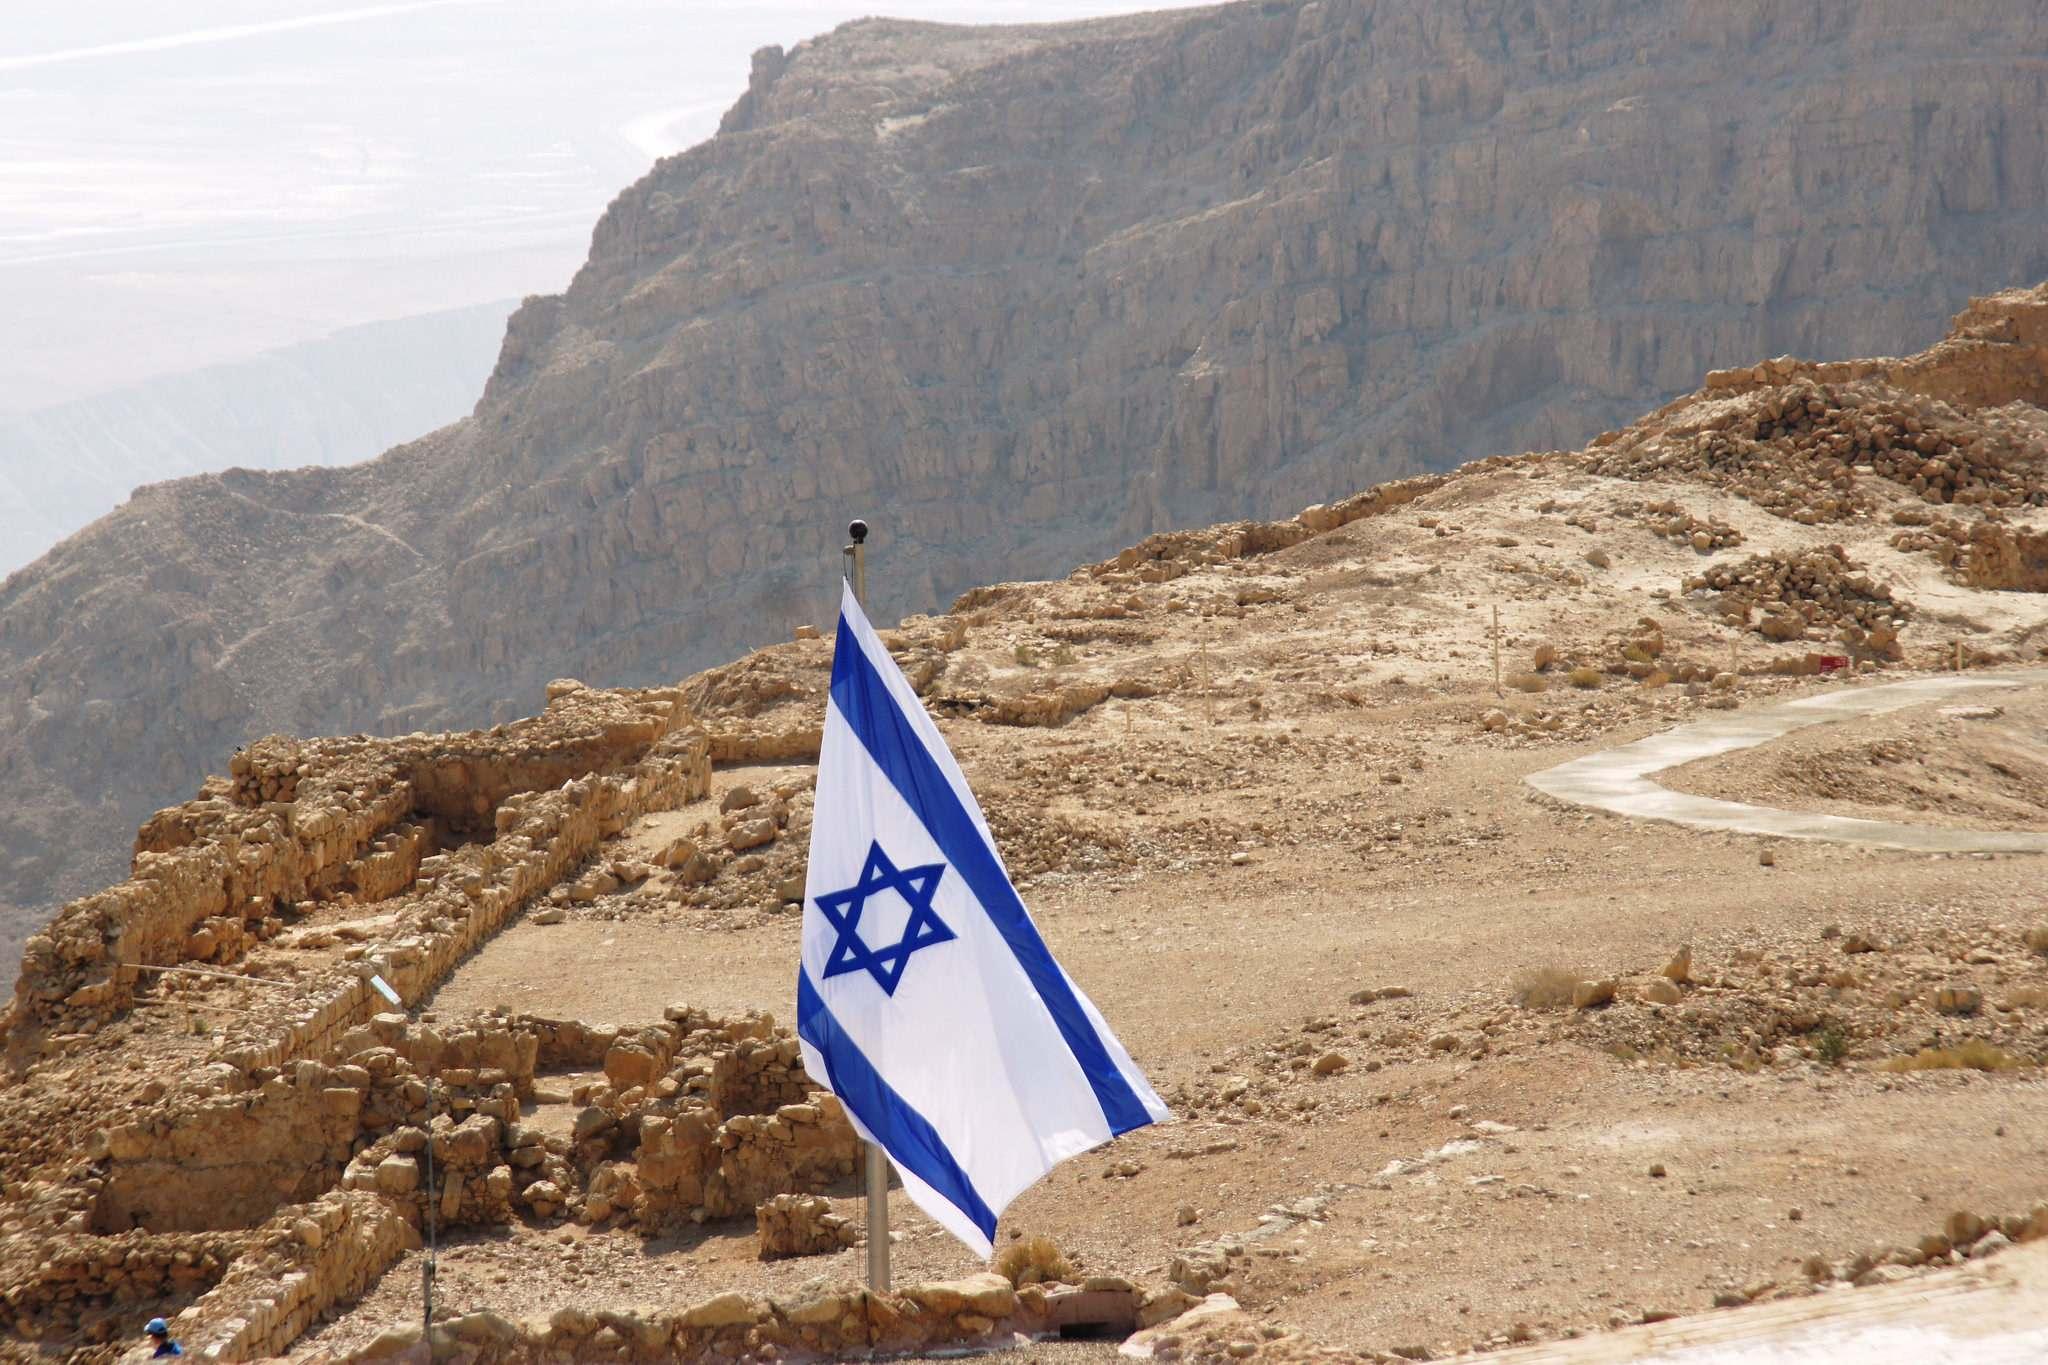 masada1 Masada Desert Fortress in Israel